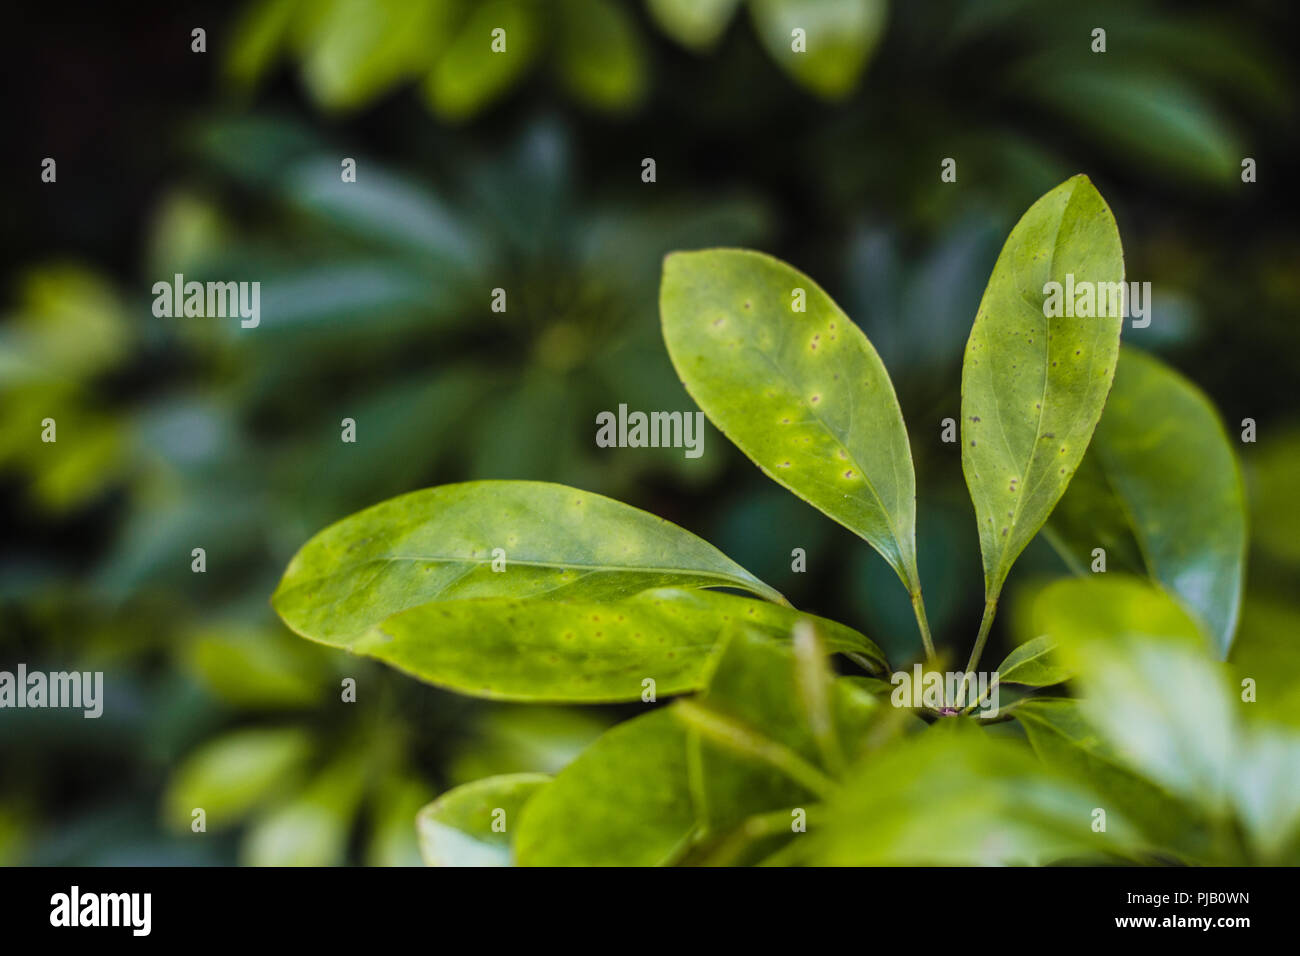 Close up plant - Stock Image